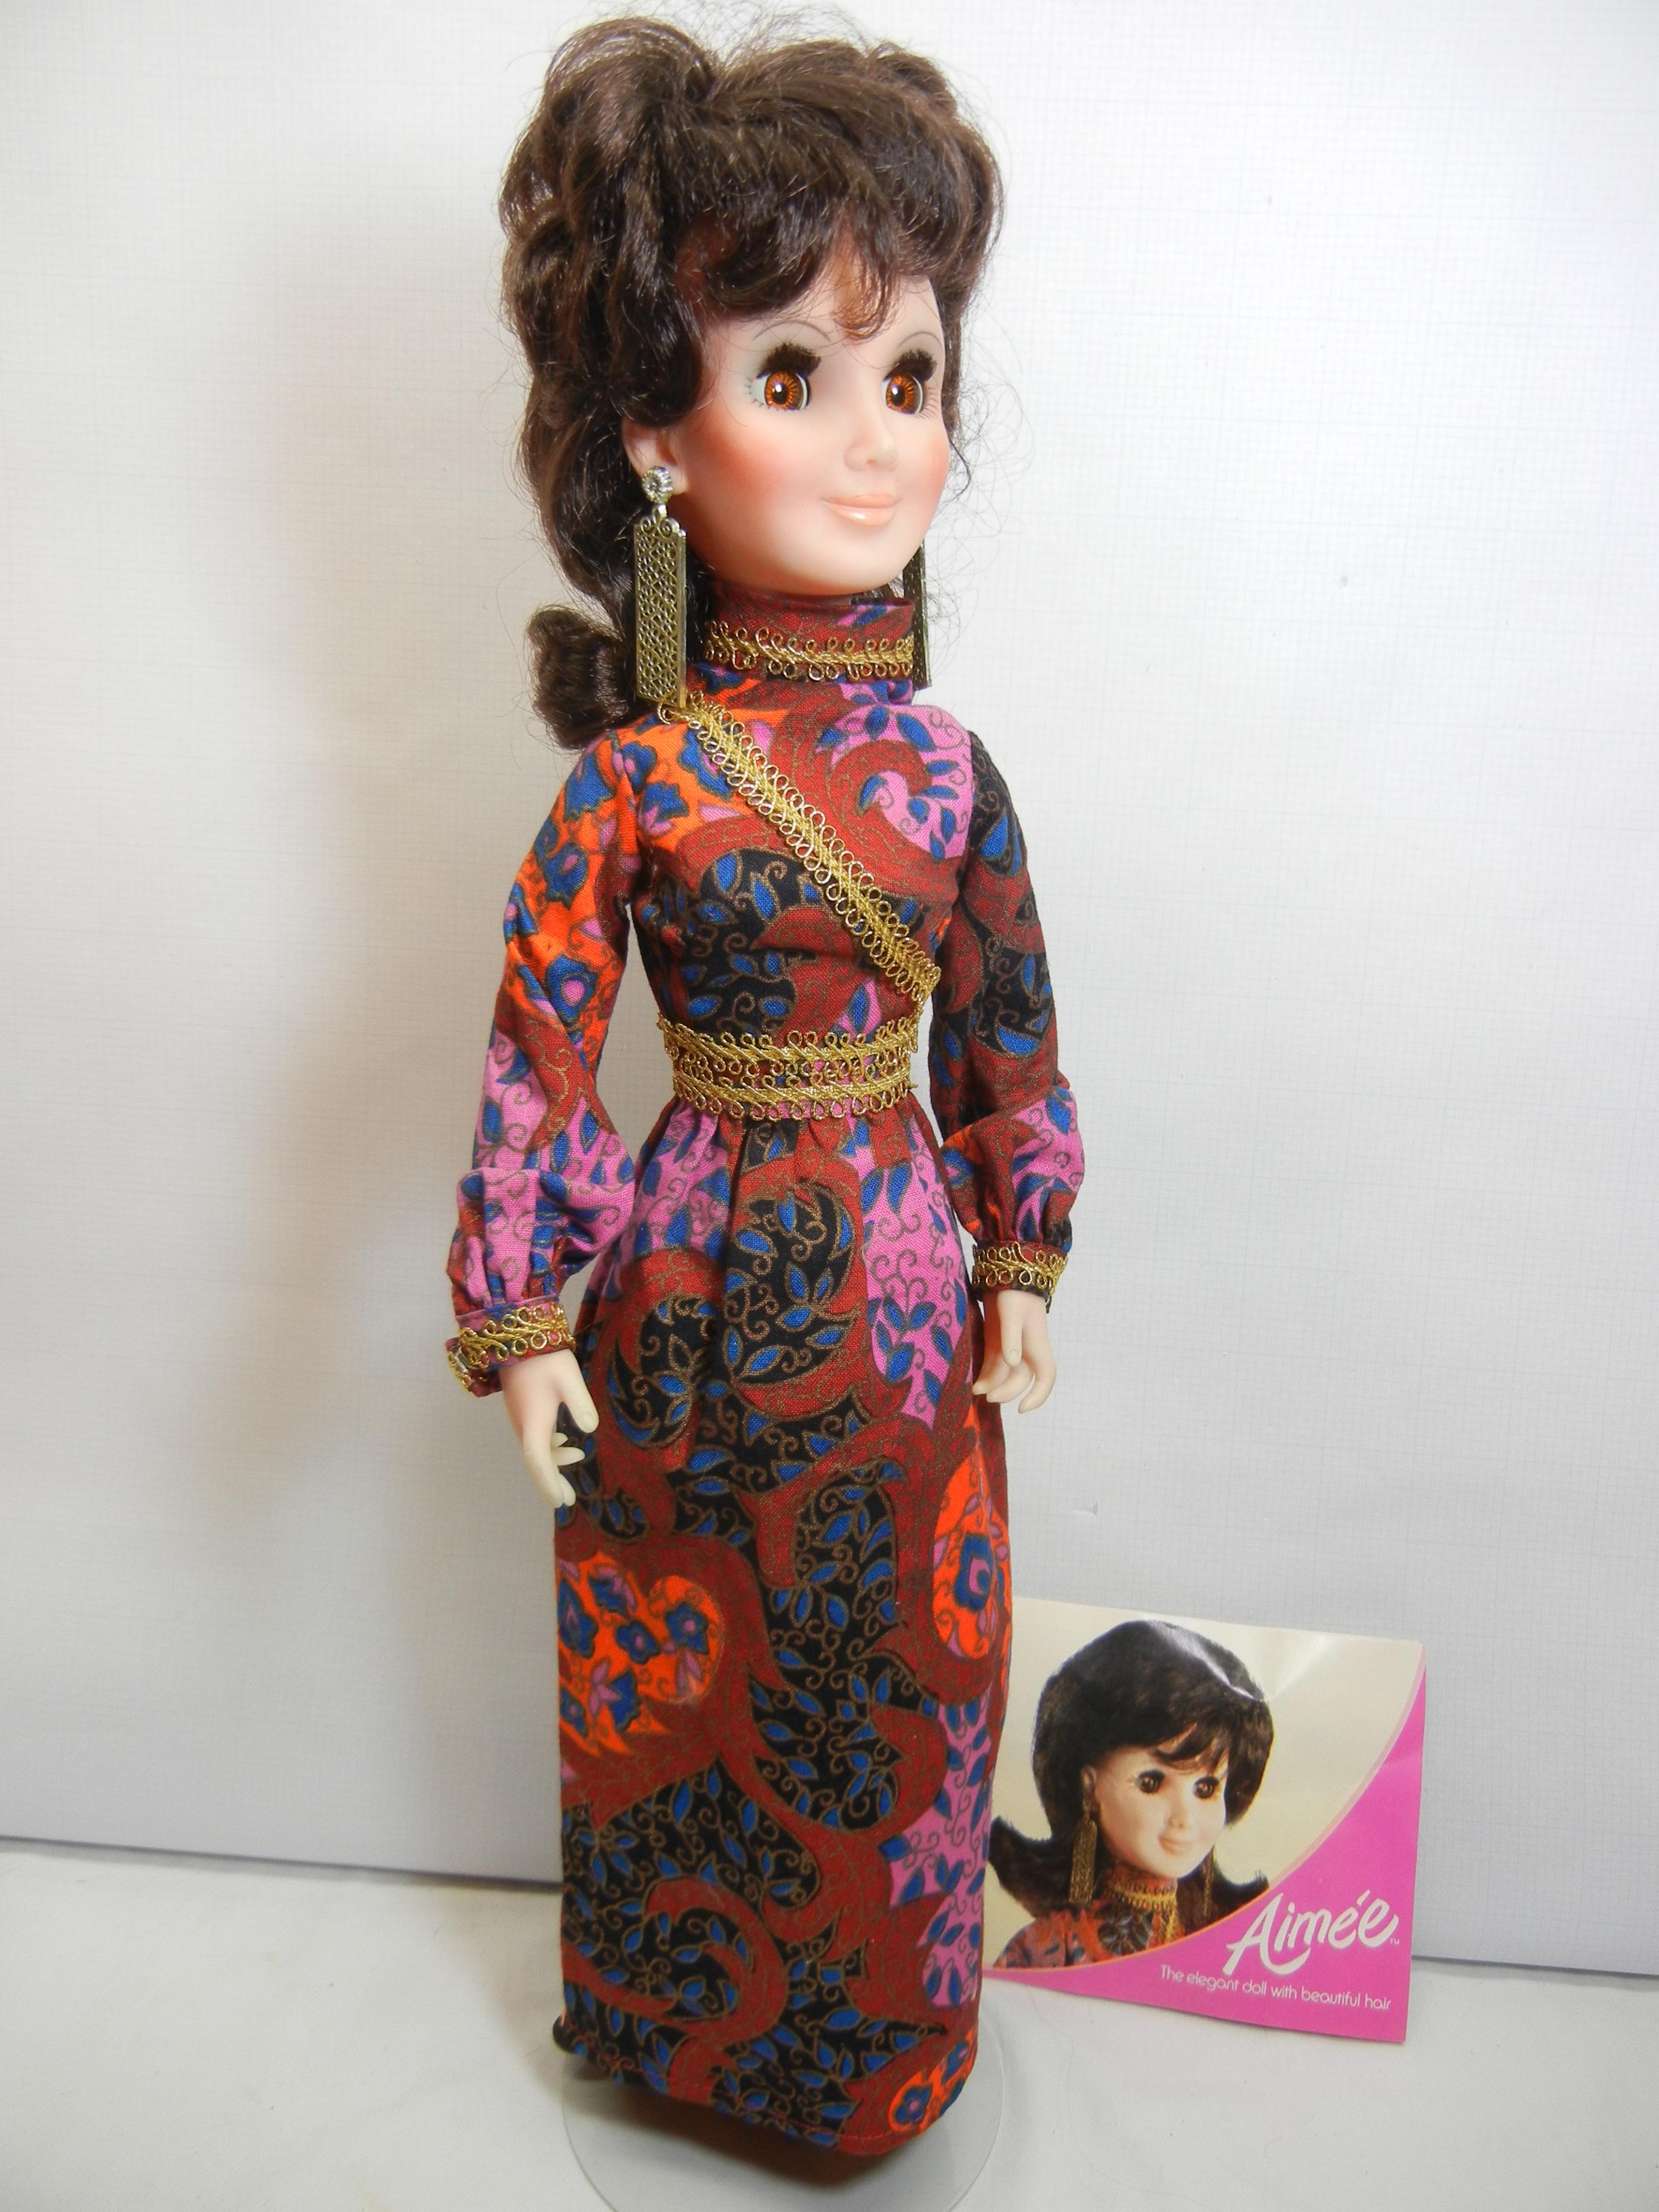 1970s Aimee Doll